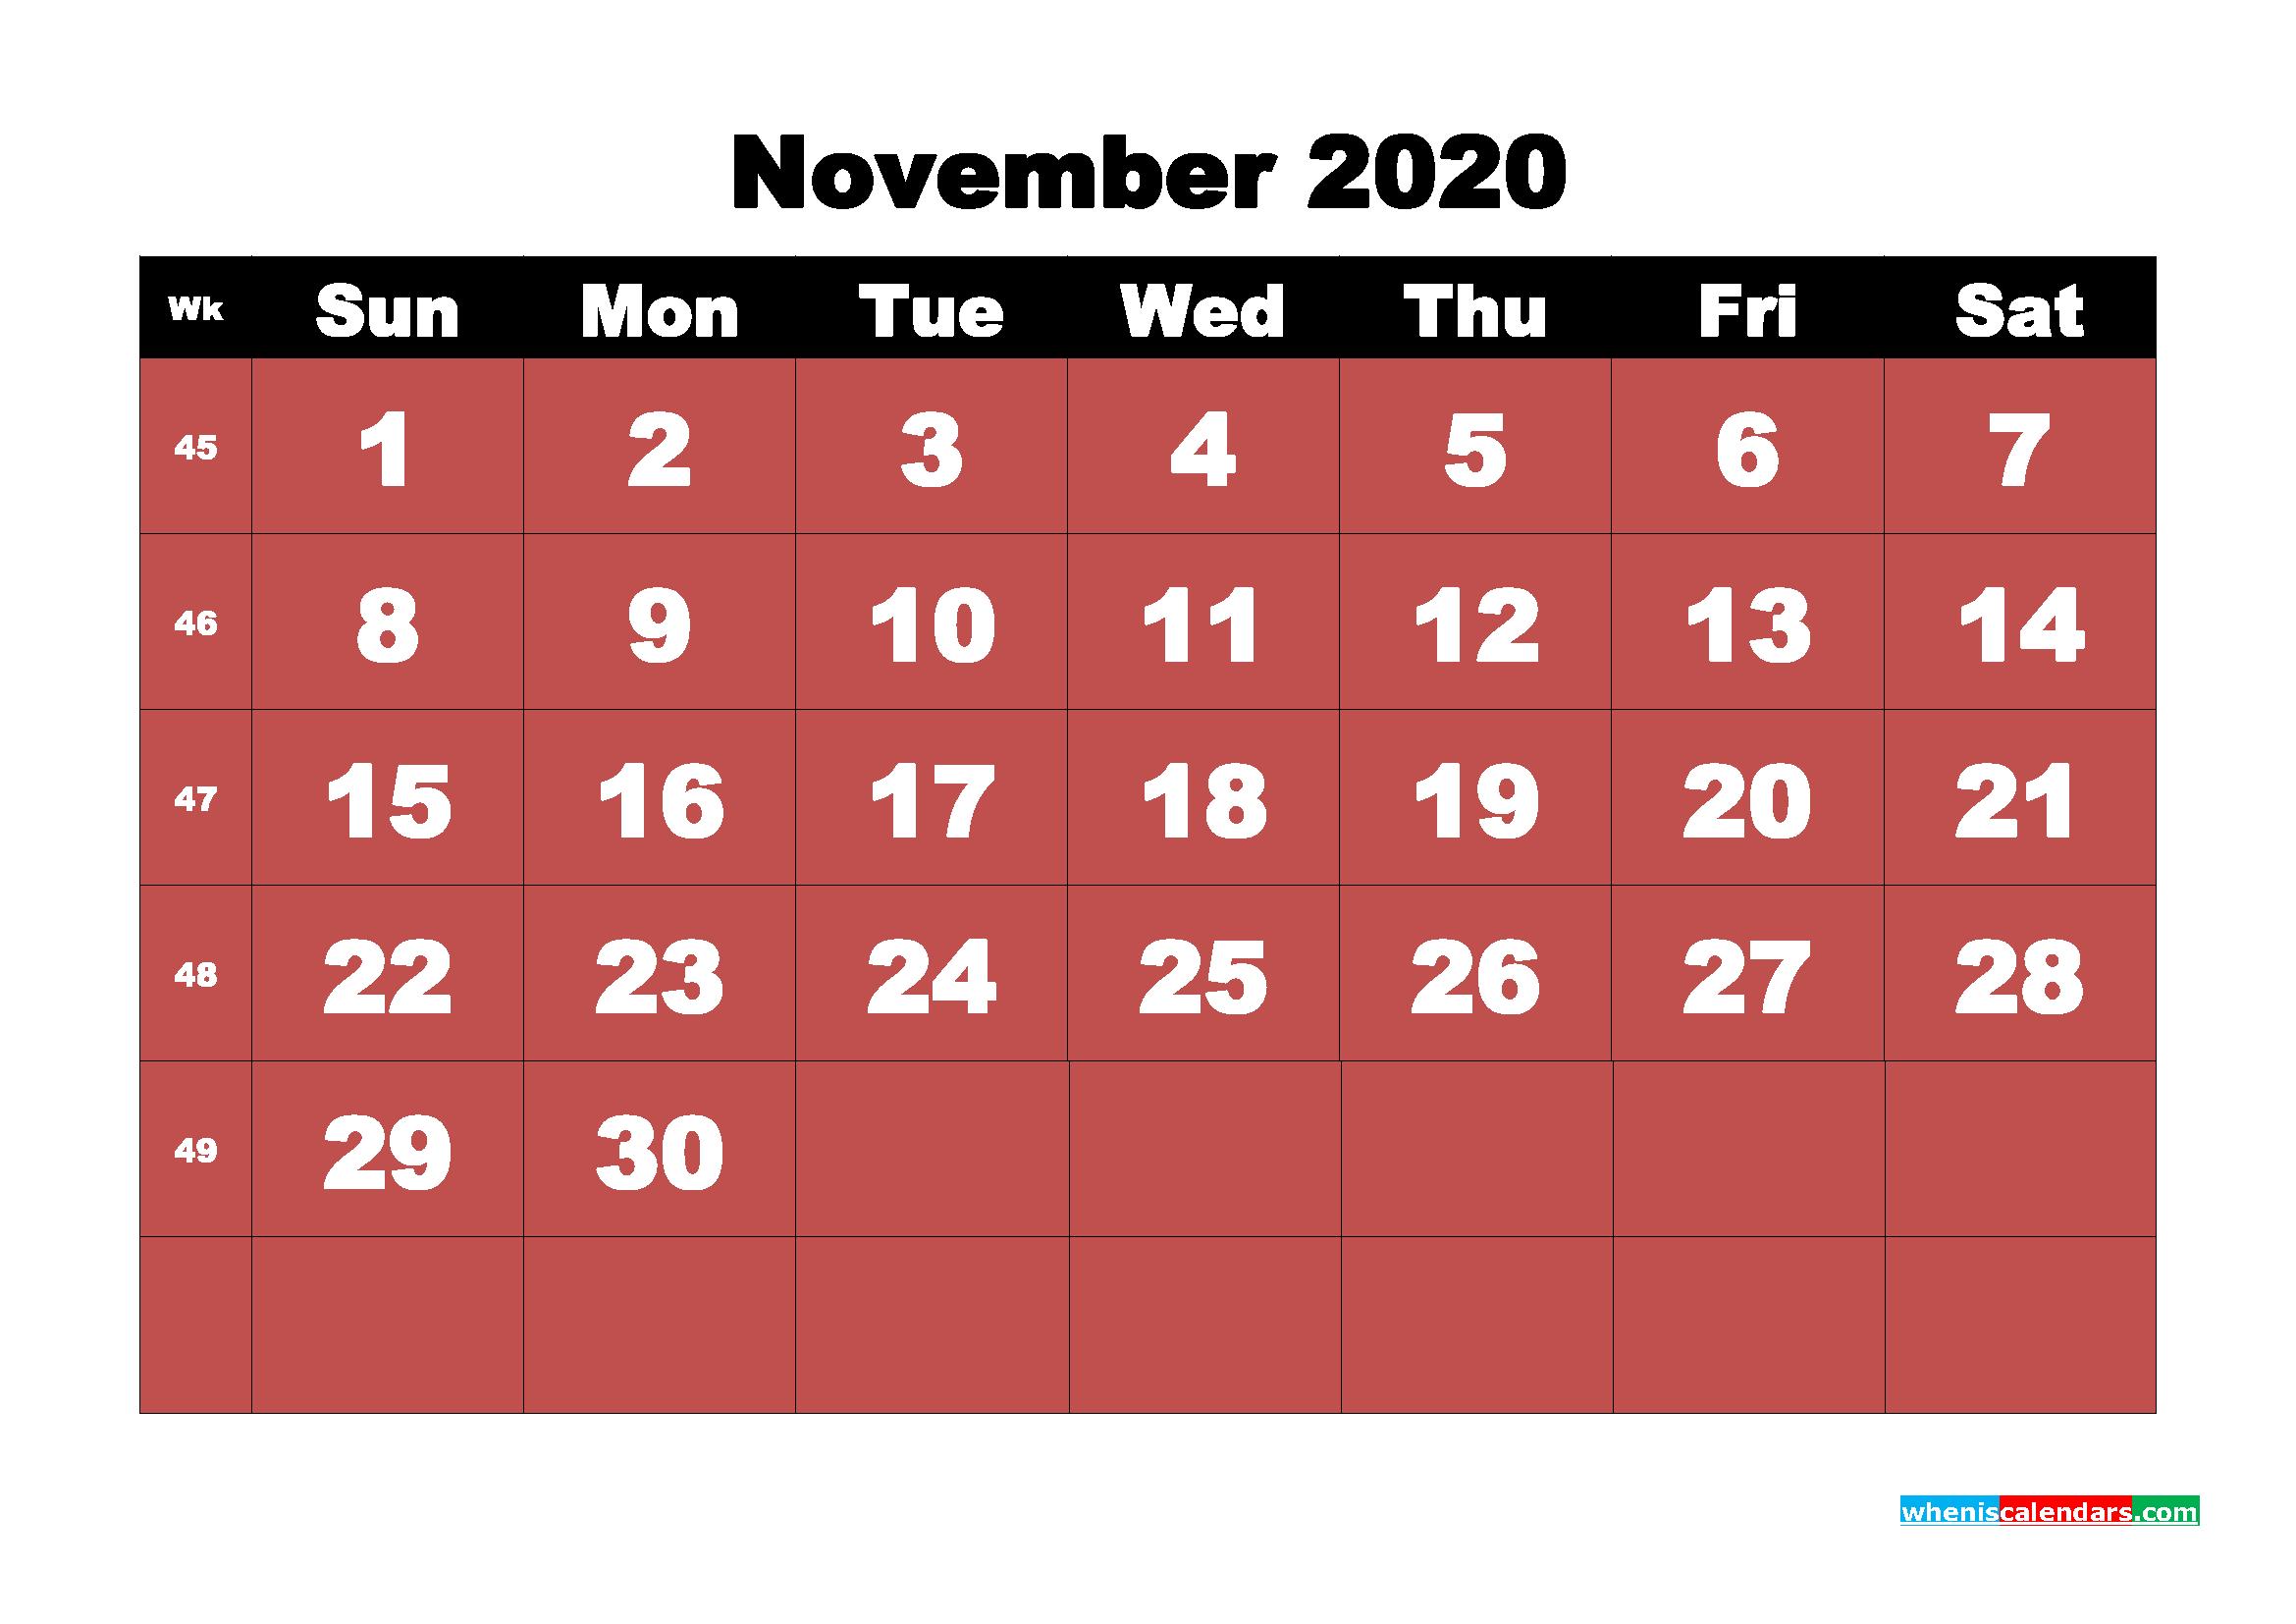 November Printable Calendar 2020 PDF, Word - No.m20b23